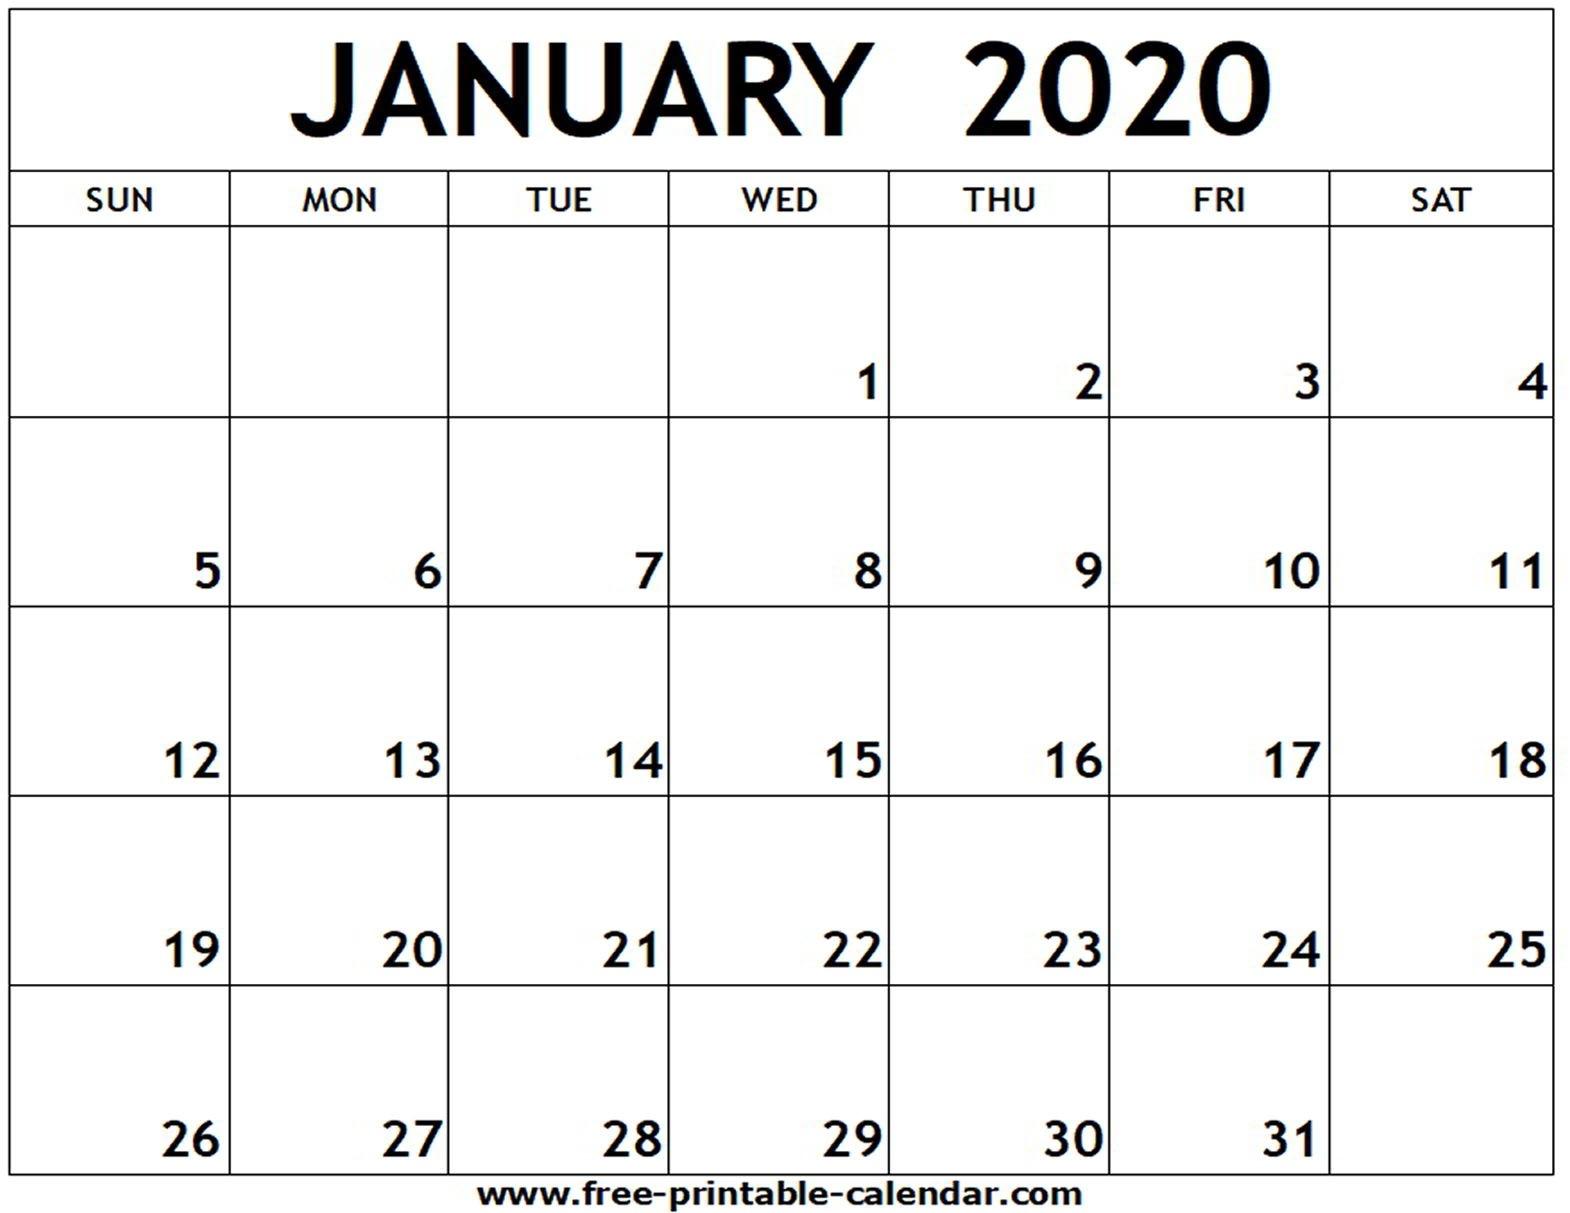 January 2020 Printable Calendar - Free-Printable-Calendar-Image Of January 2020 Calendar